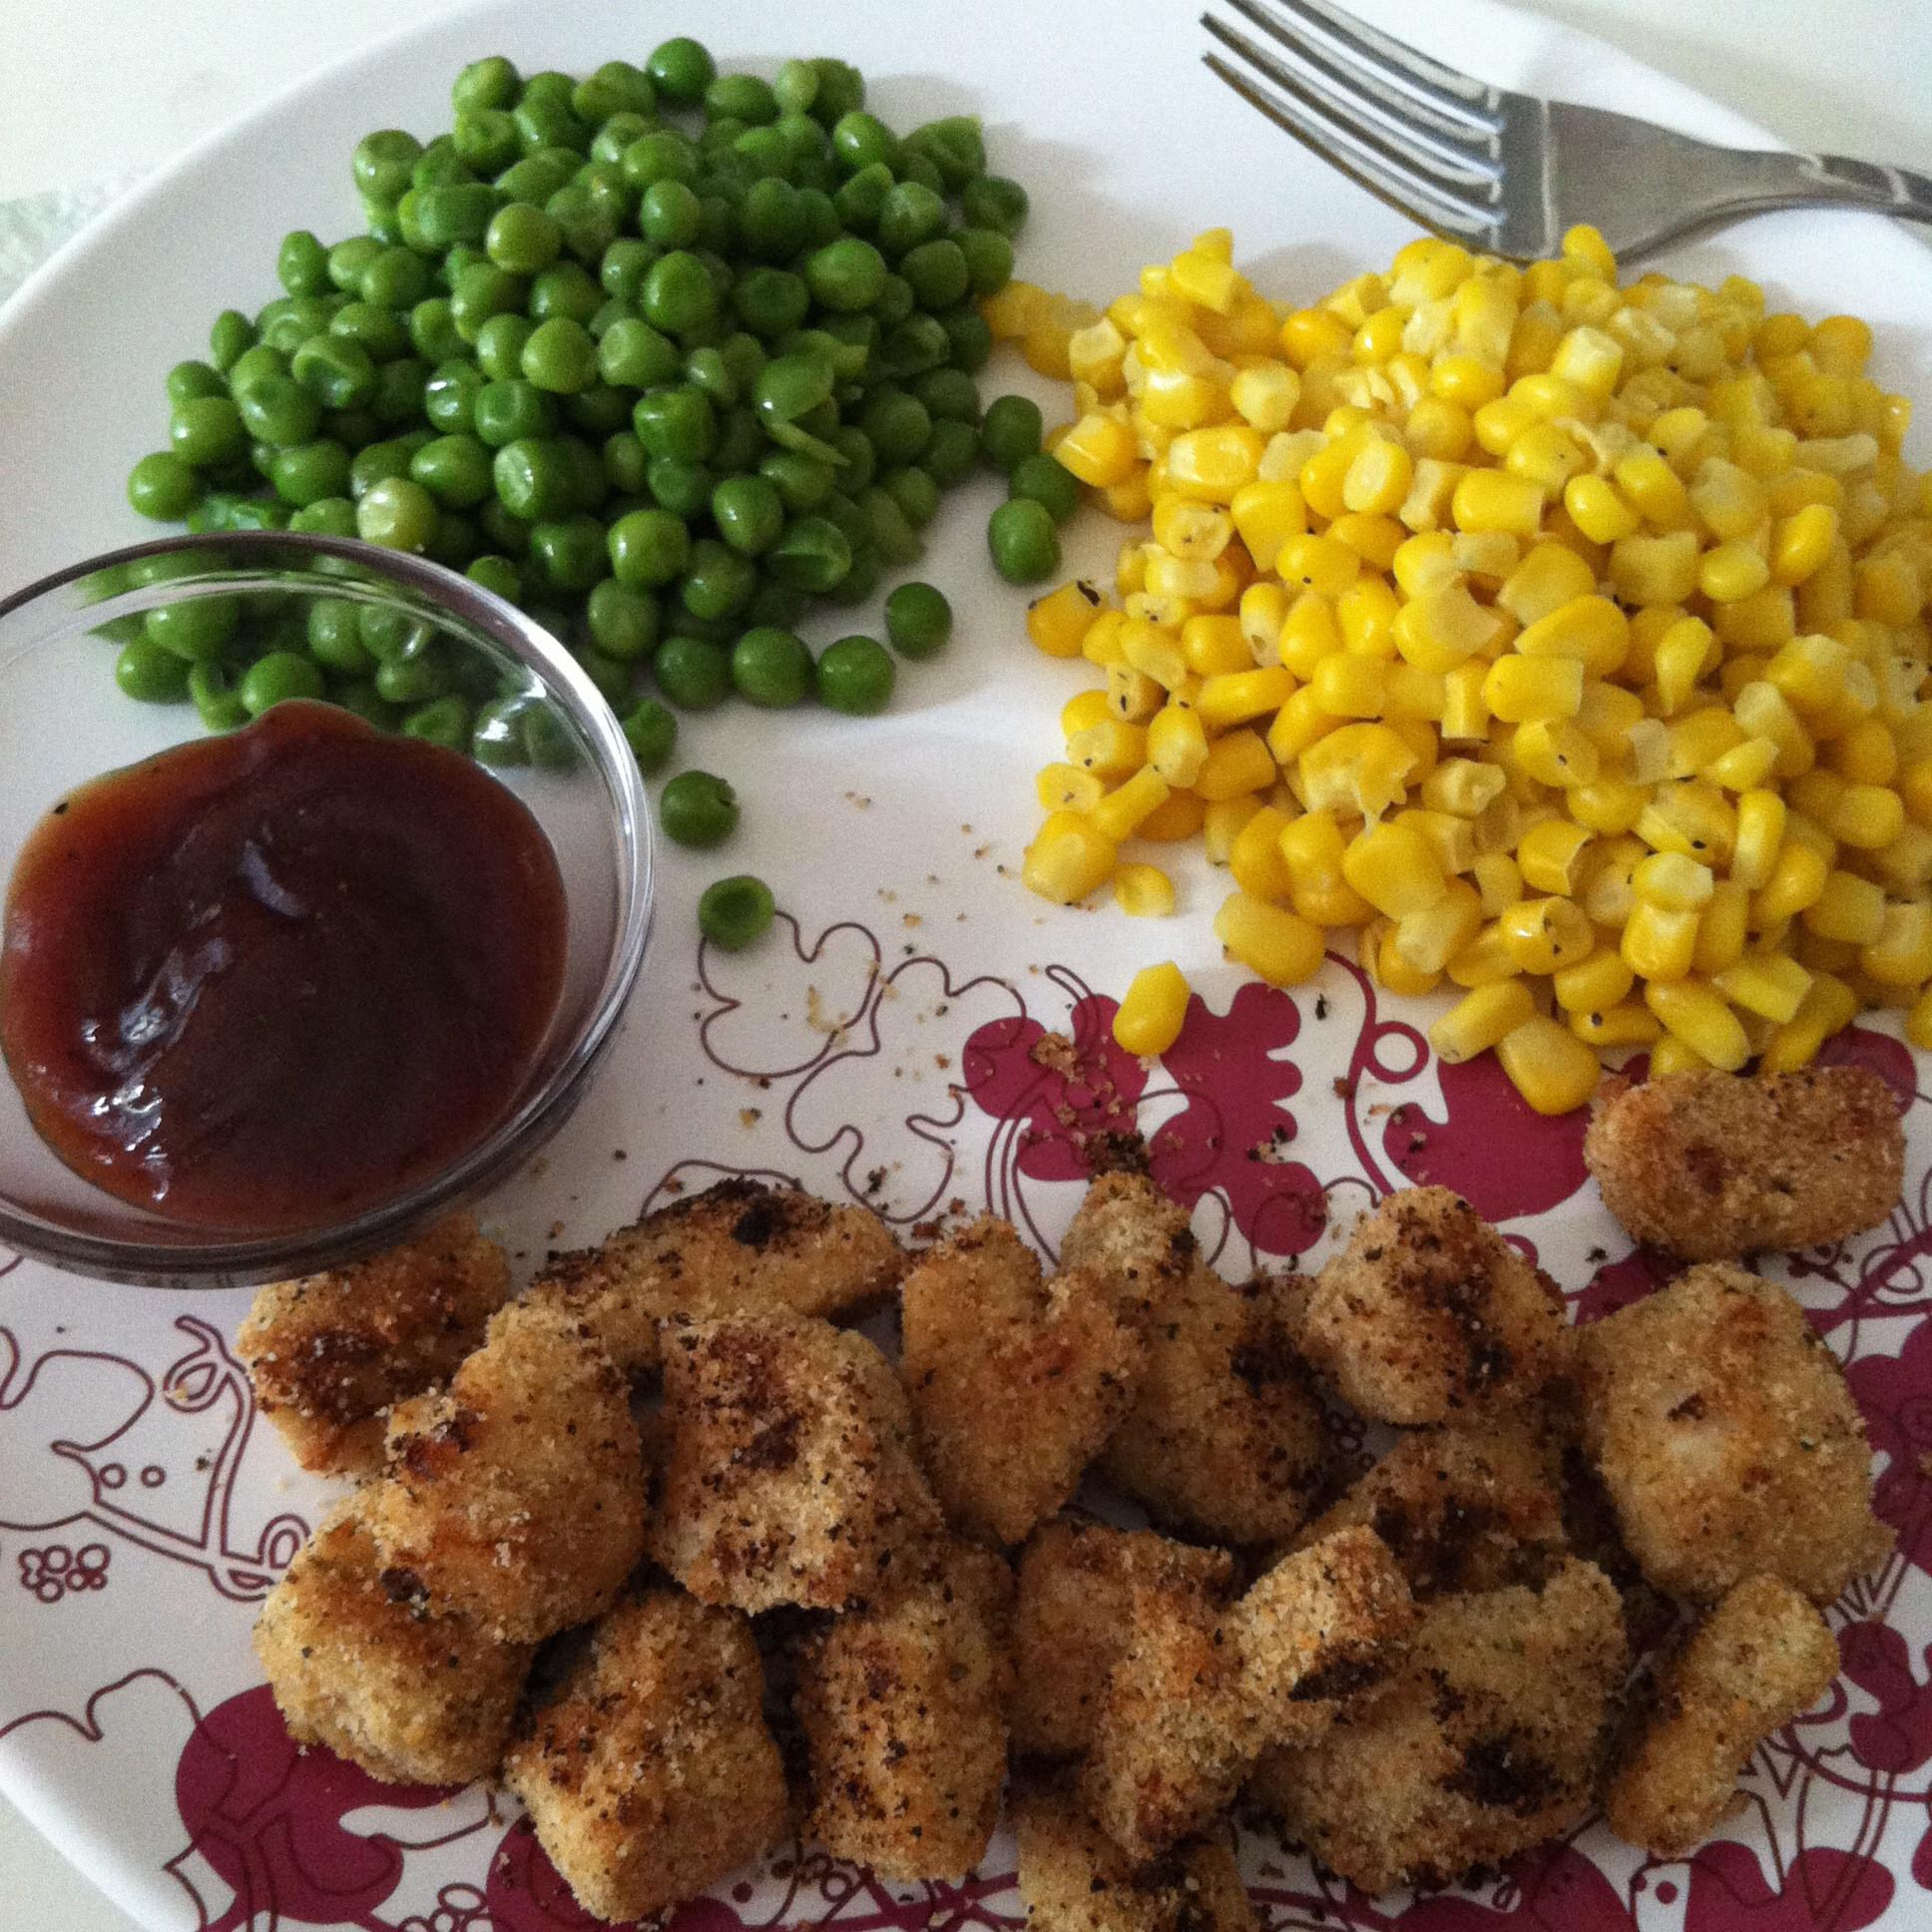 Baked Chicken Nuggets Recipe  Skinnytaste Healthy Baked Chicken Nug s BigOven